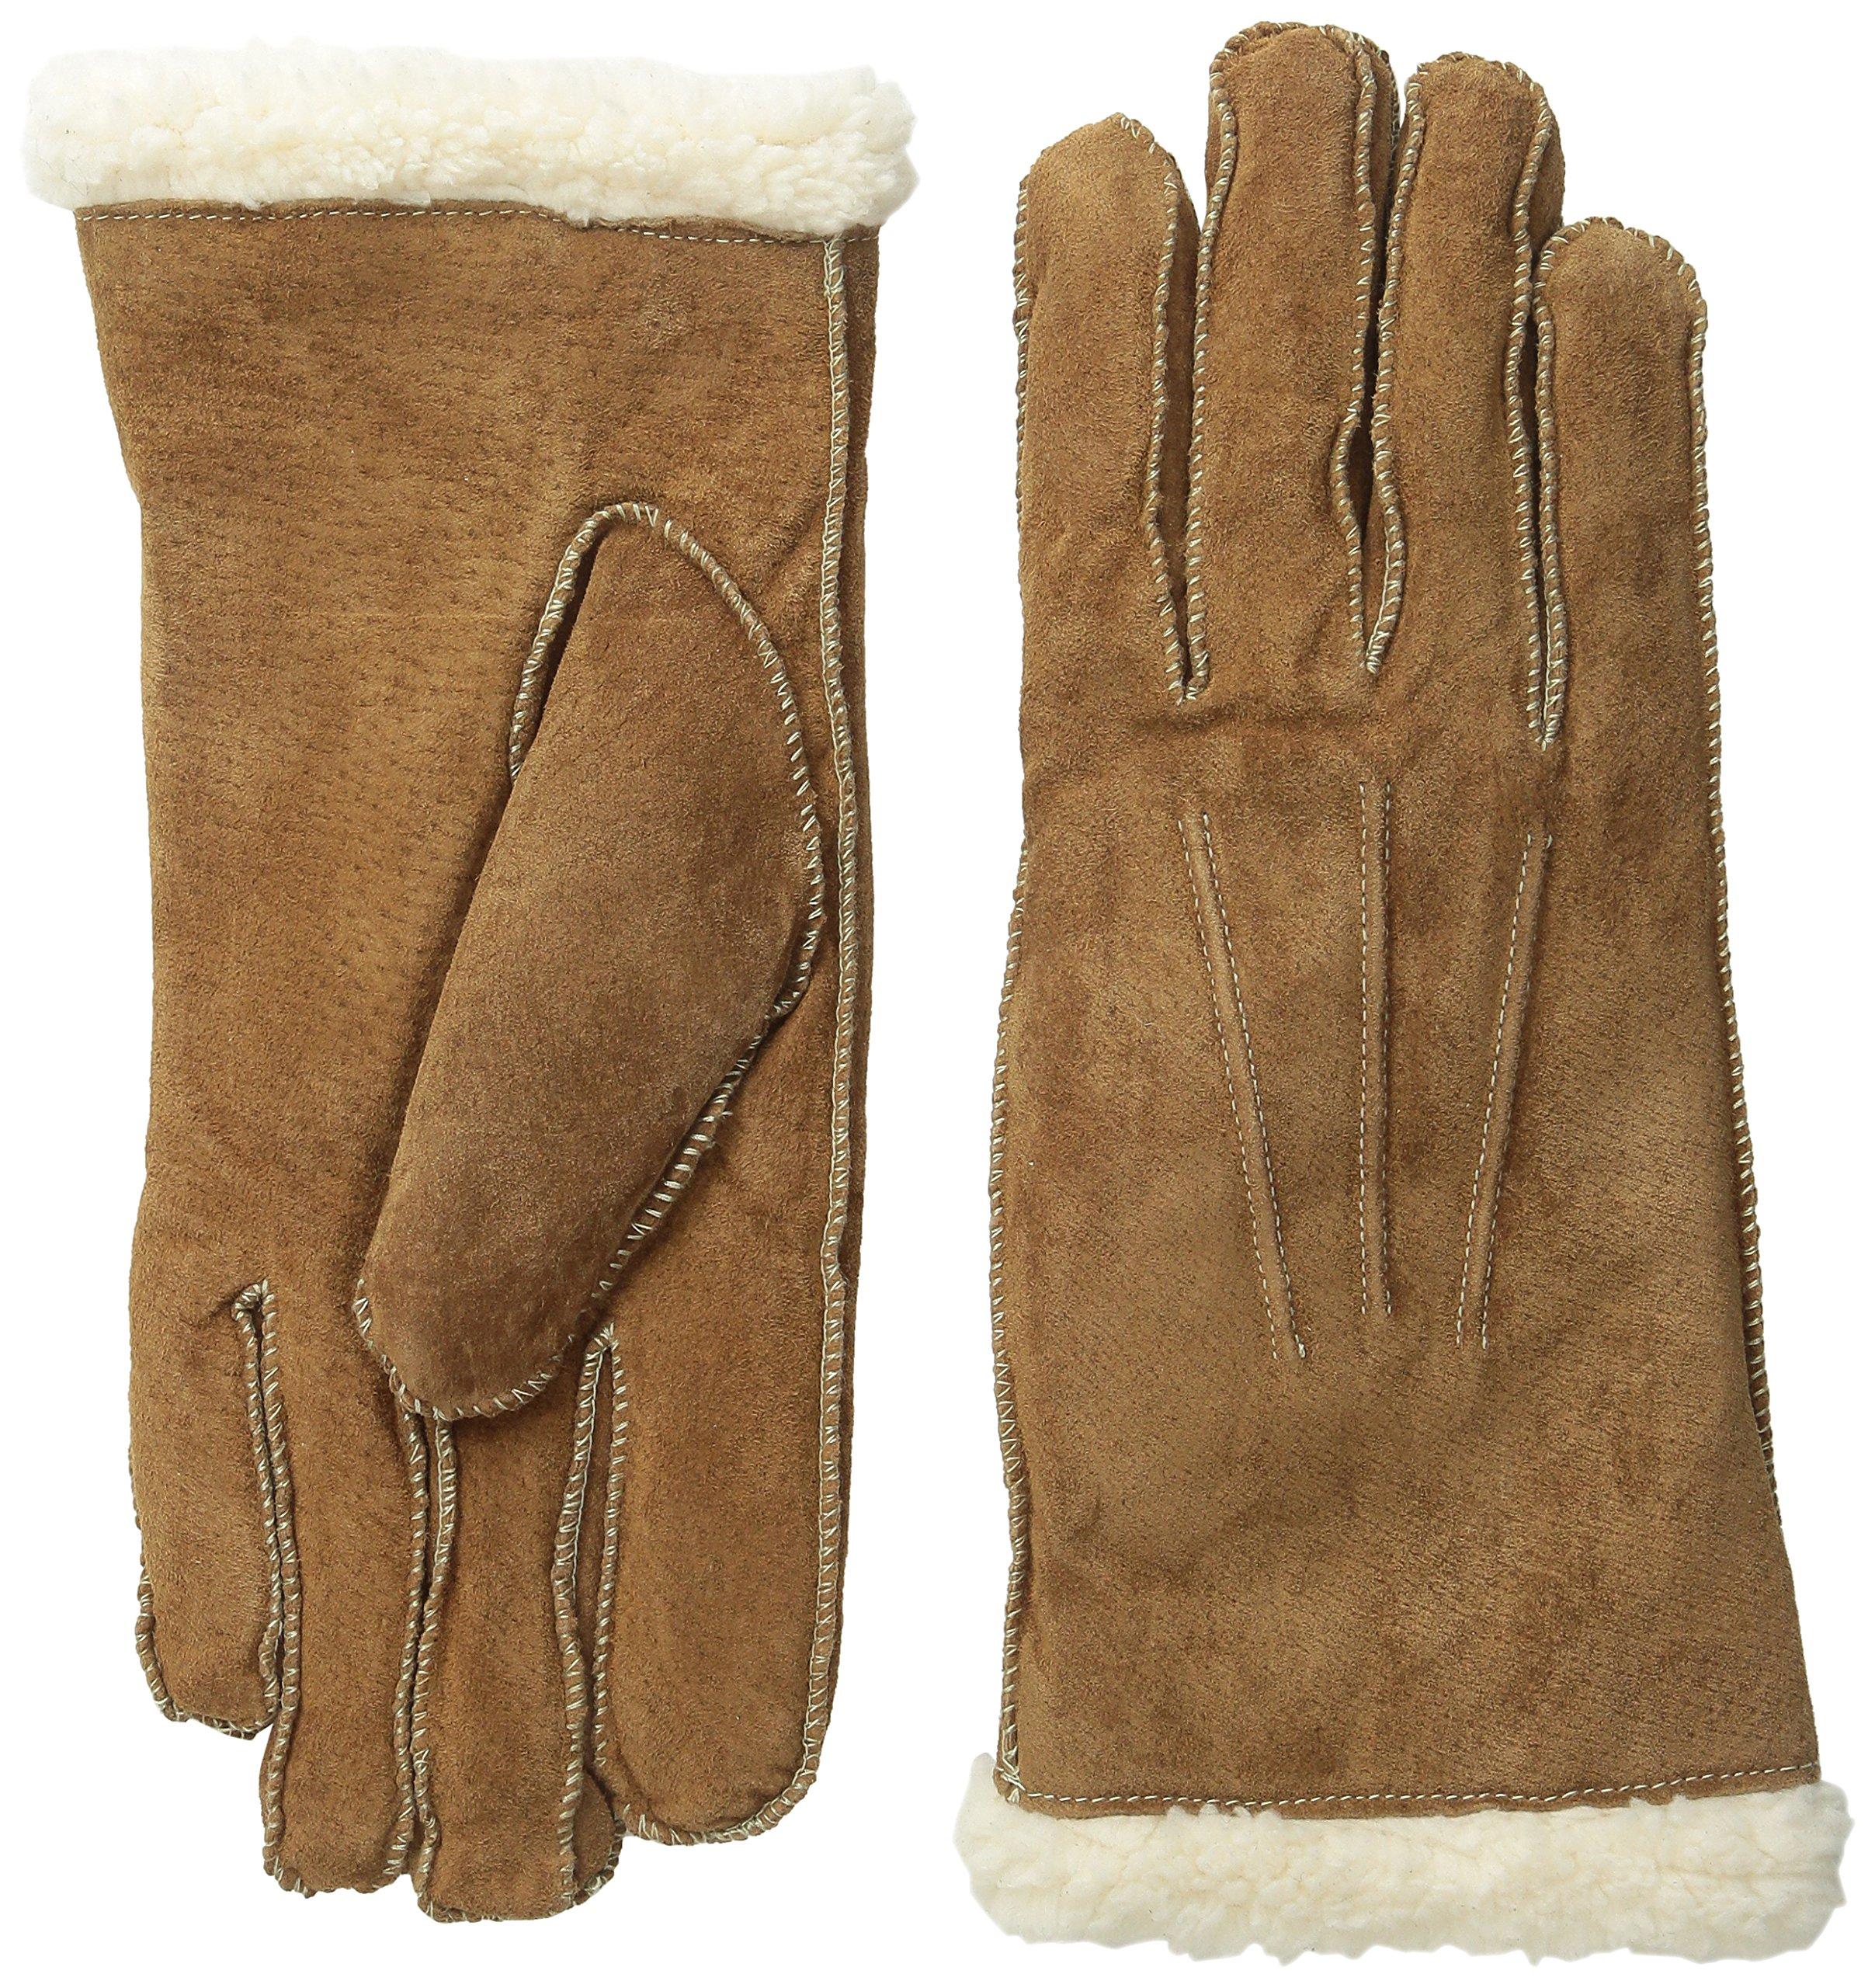 Isotoner Women's Sherpasoft Pigsplit Glove with Moccasin Stitch, Luggage, Large